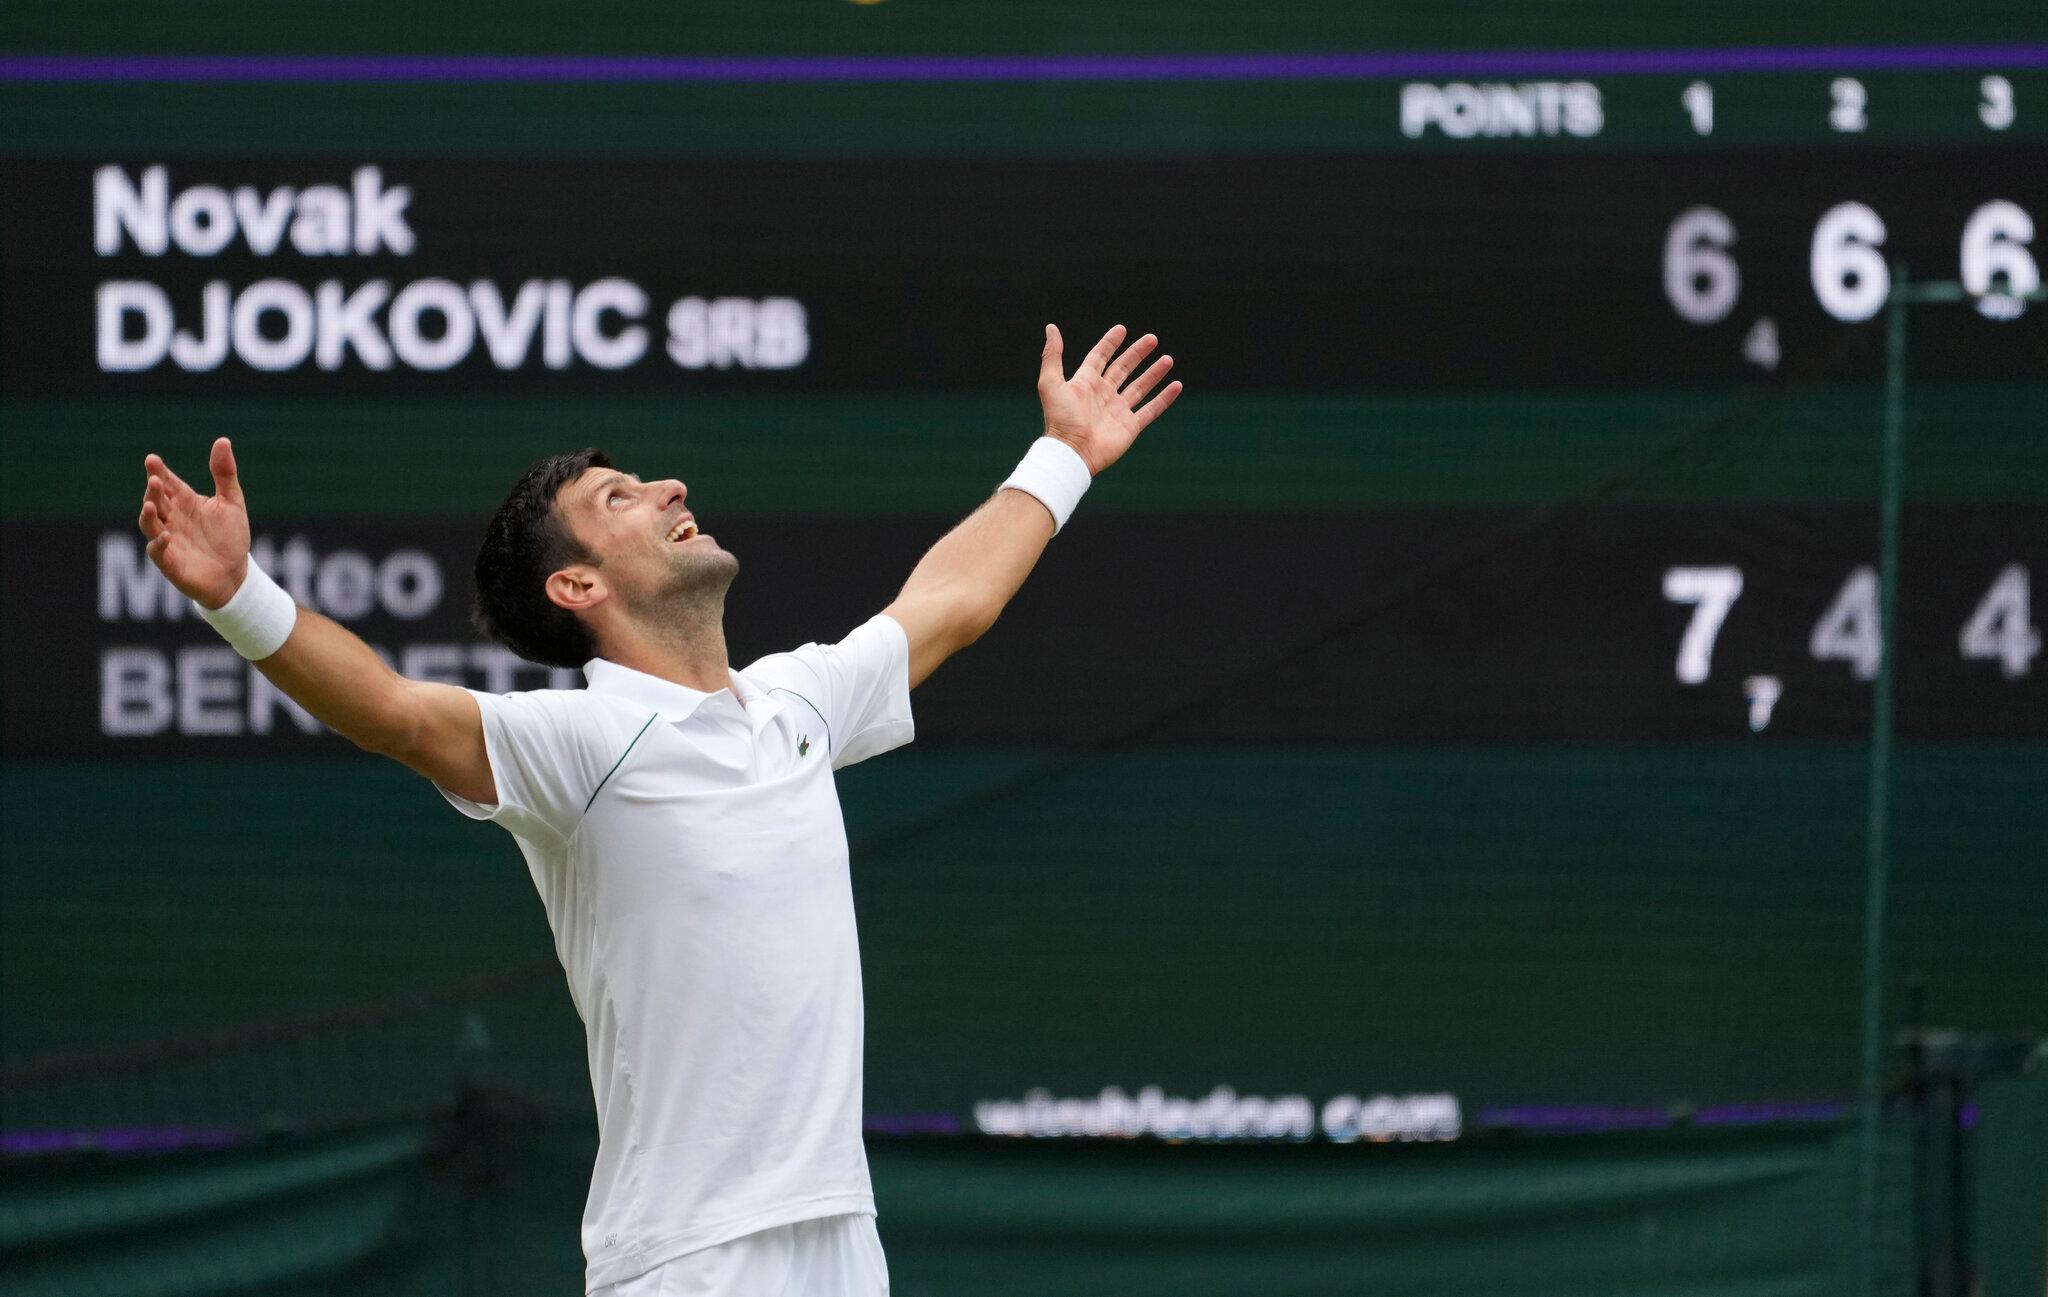 Novak wins the Wimbledon